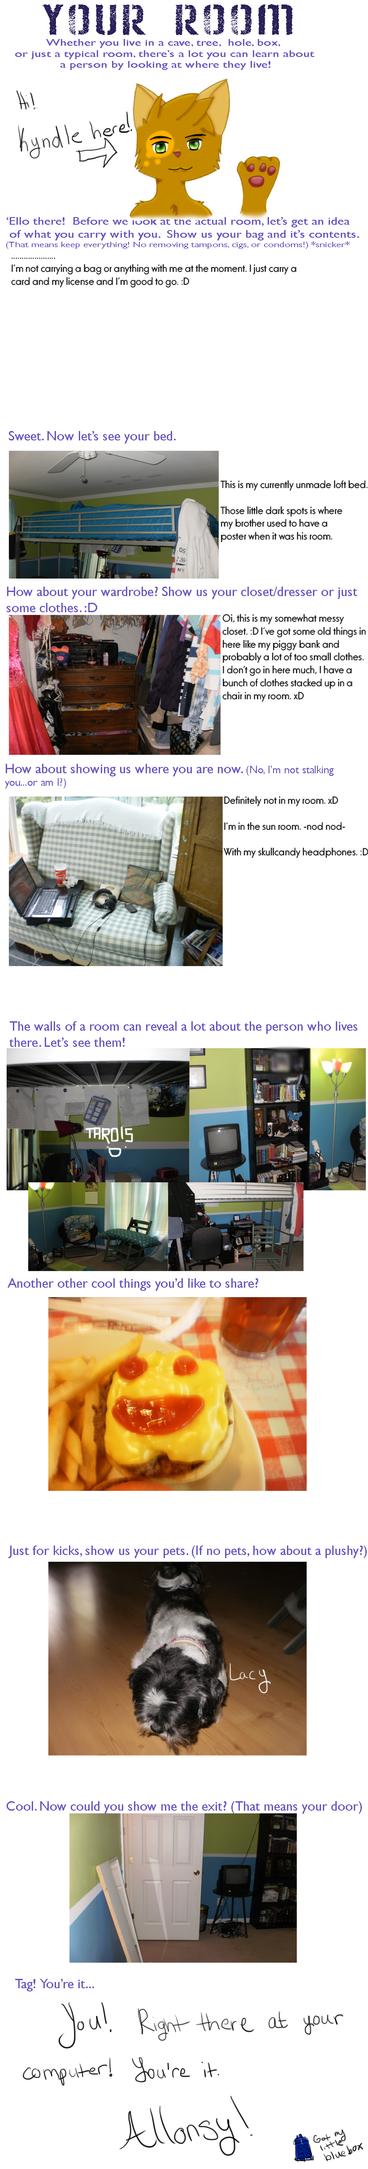 Room Meme by whiteh-is-me